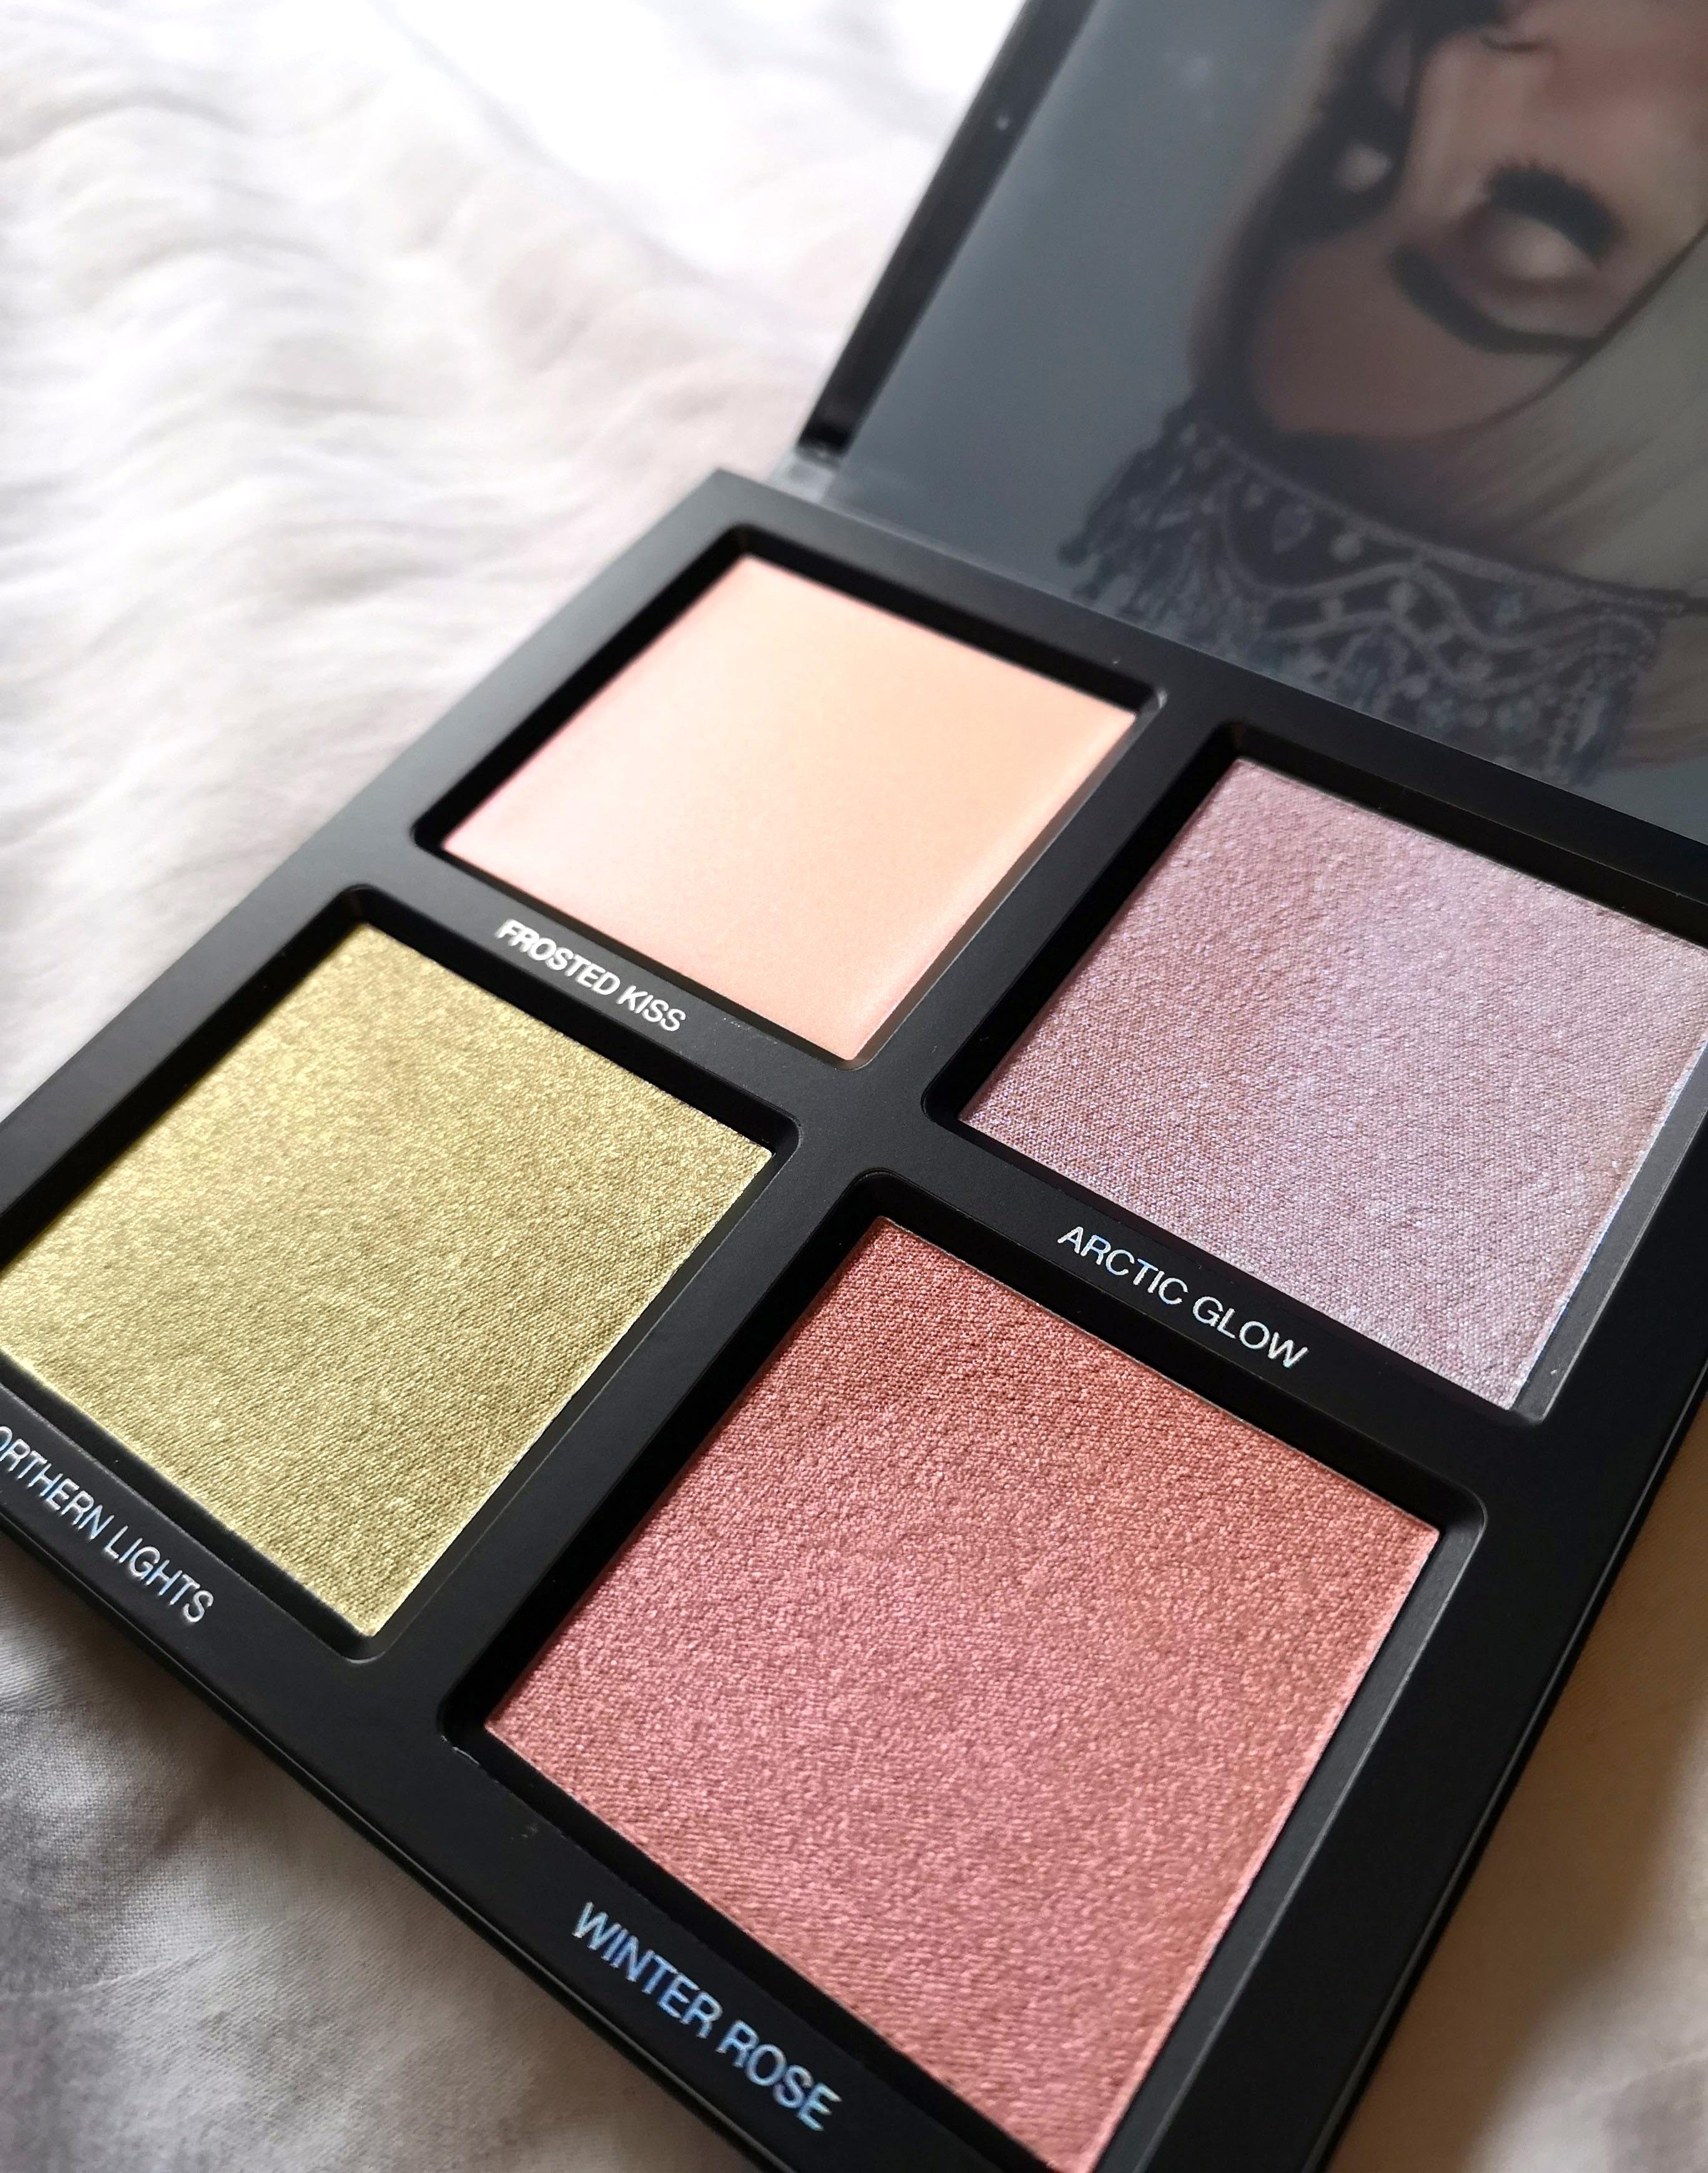 Huda Beauty highlighter Glossybox 2018